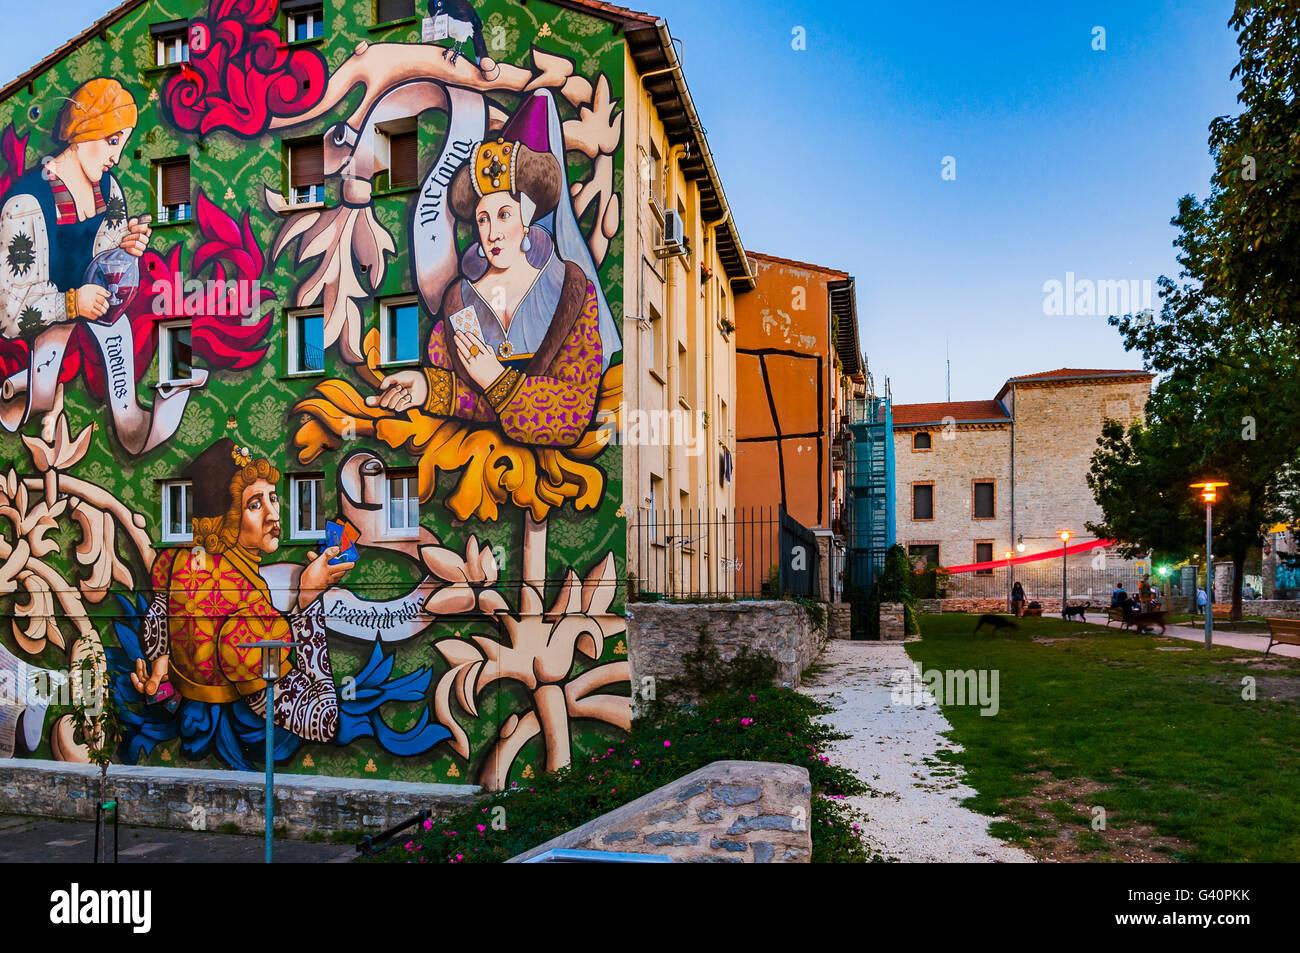 El Triunfo de Vitoria. Mural itinerary of Vitoria, IMVG. Calle Santa María 9. Vitoria-Gasteiz, Álava, - Stock Image